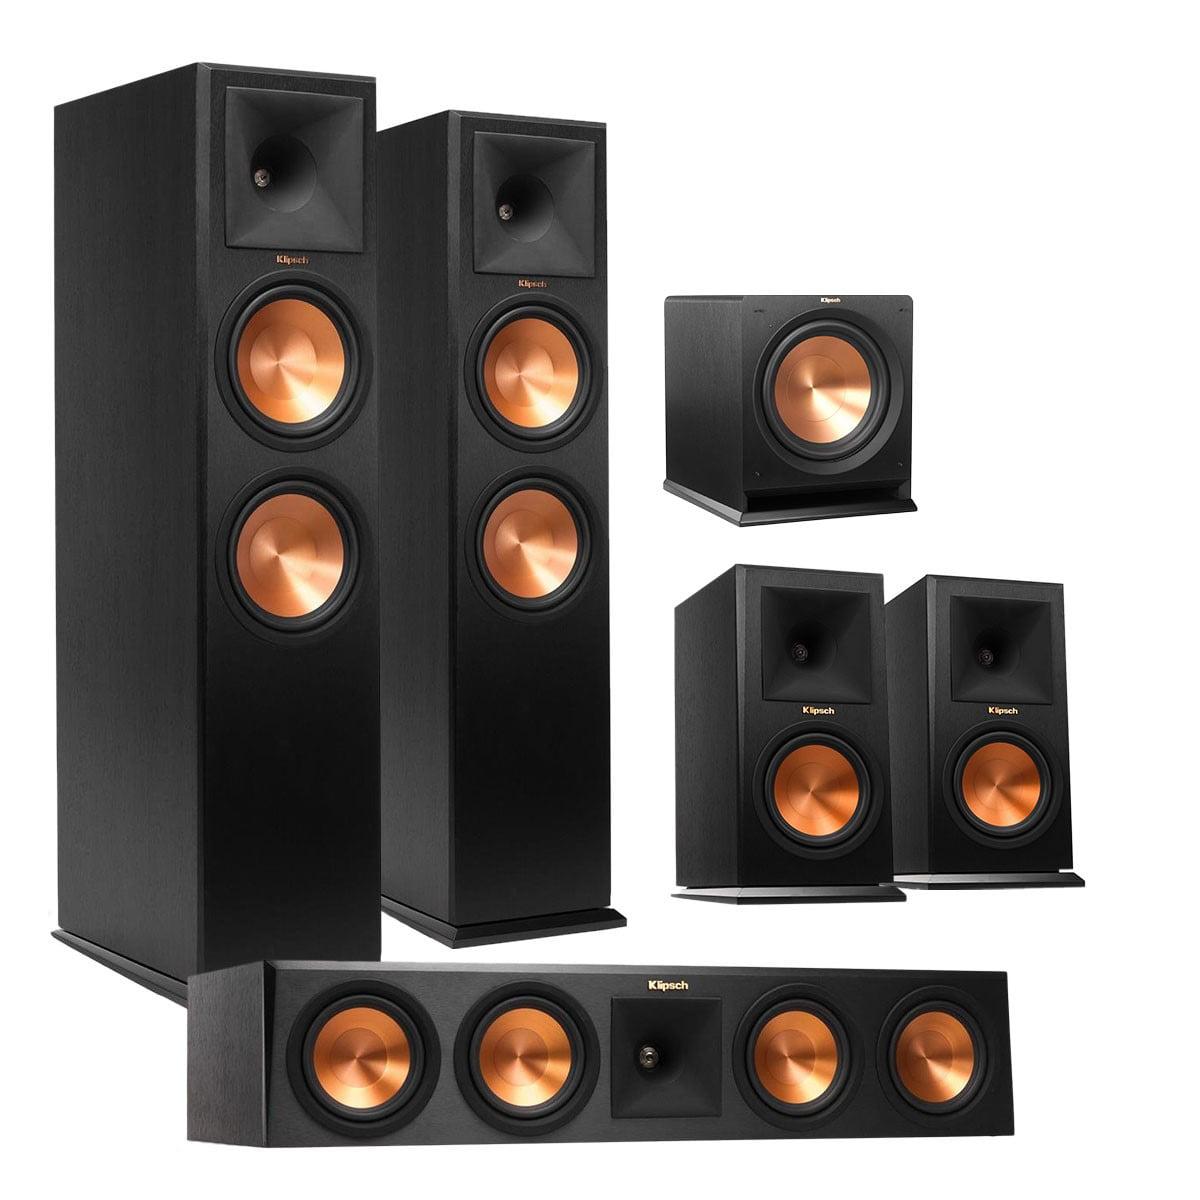 Klipsch 5.1 RP-280 Reference Premiere Speaker Package with R-112 Subwoofer (Ebony) by Klipsch